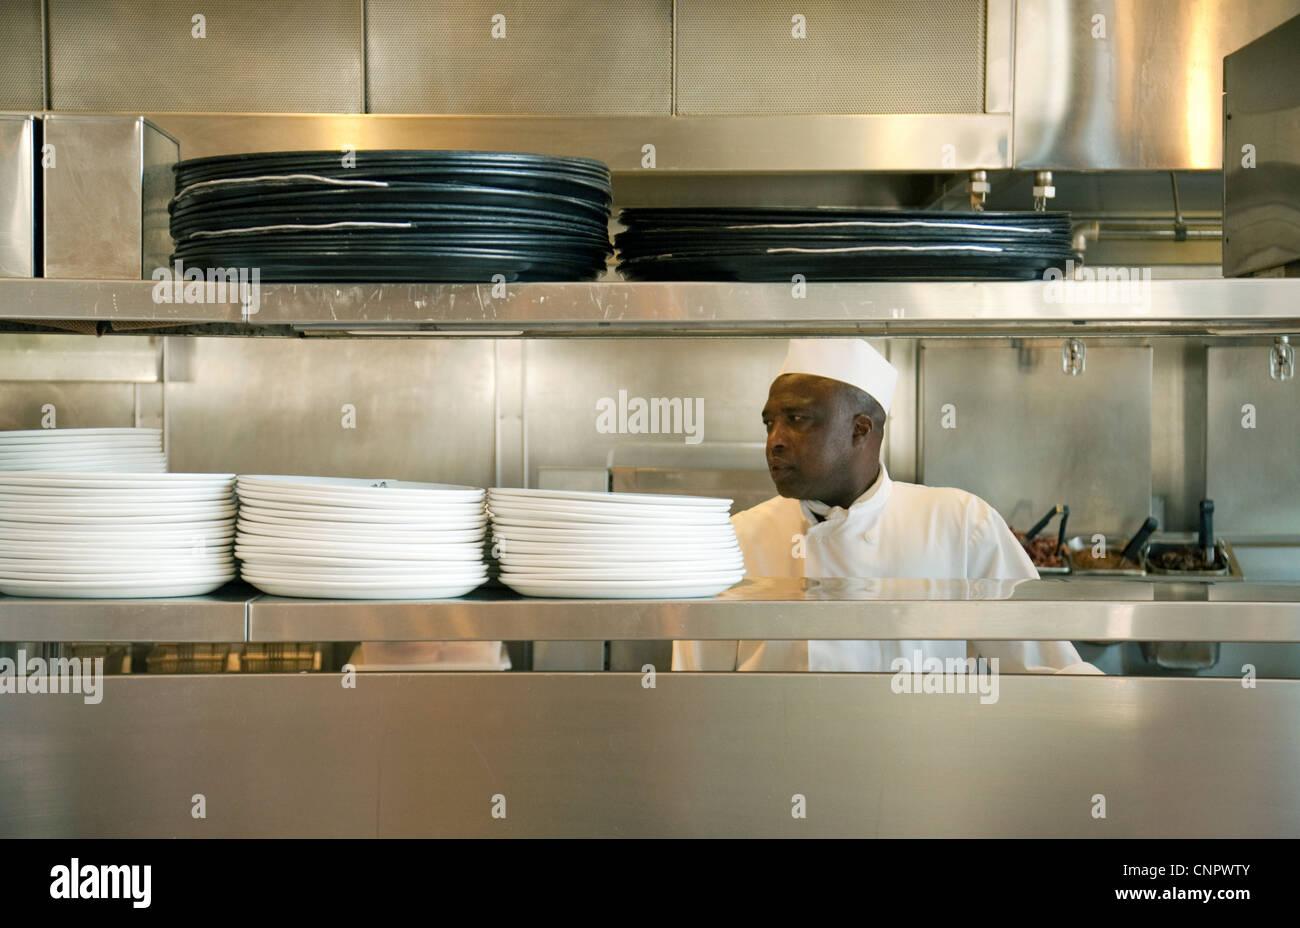 A restaurant chef at work in his kitchen, Disneyland Paris France Europe - Stock Image